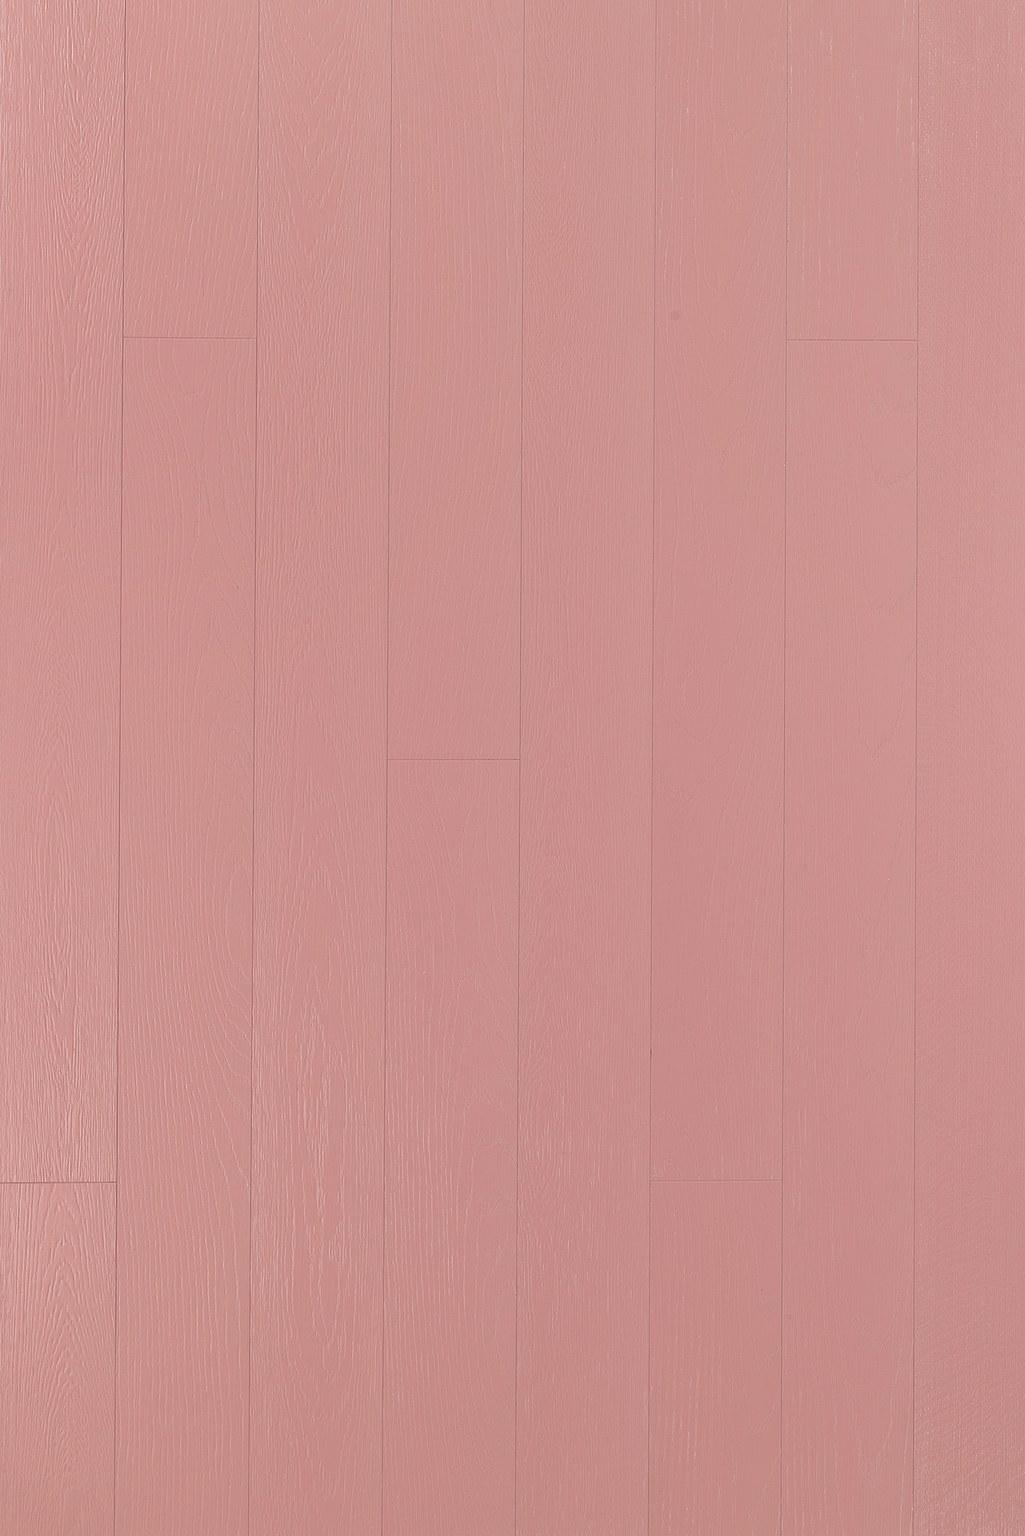 Timberwise Parketti Lankkuparketti Puulattia Wooden Floor Parquet Plank Tammi Oak Old Rose 2D1